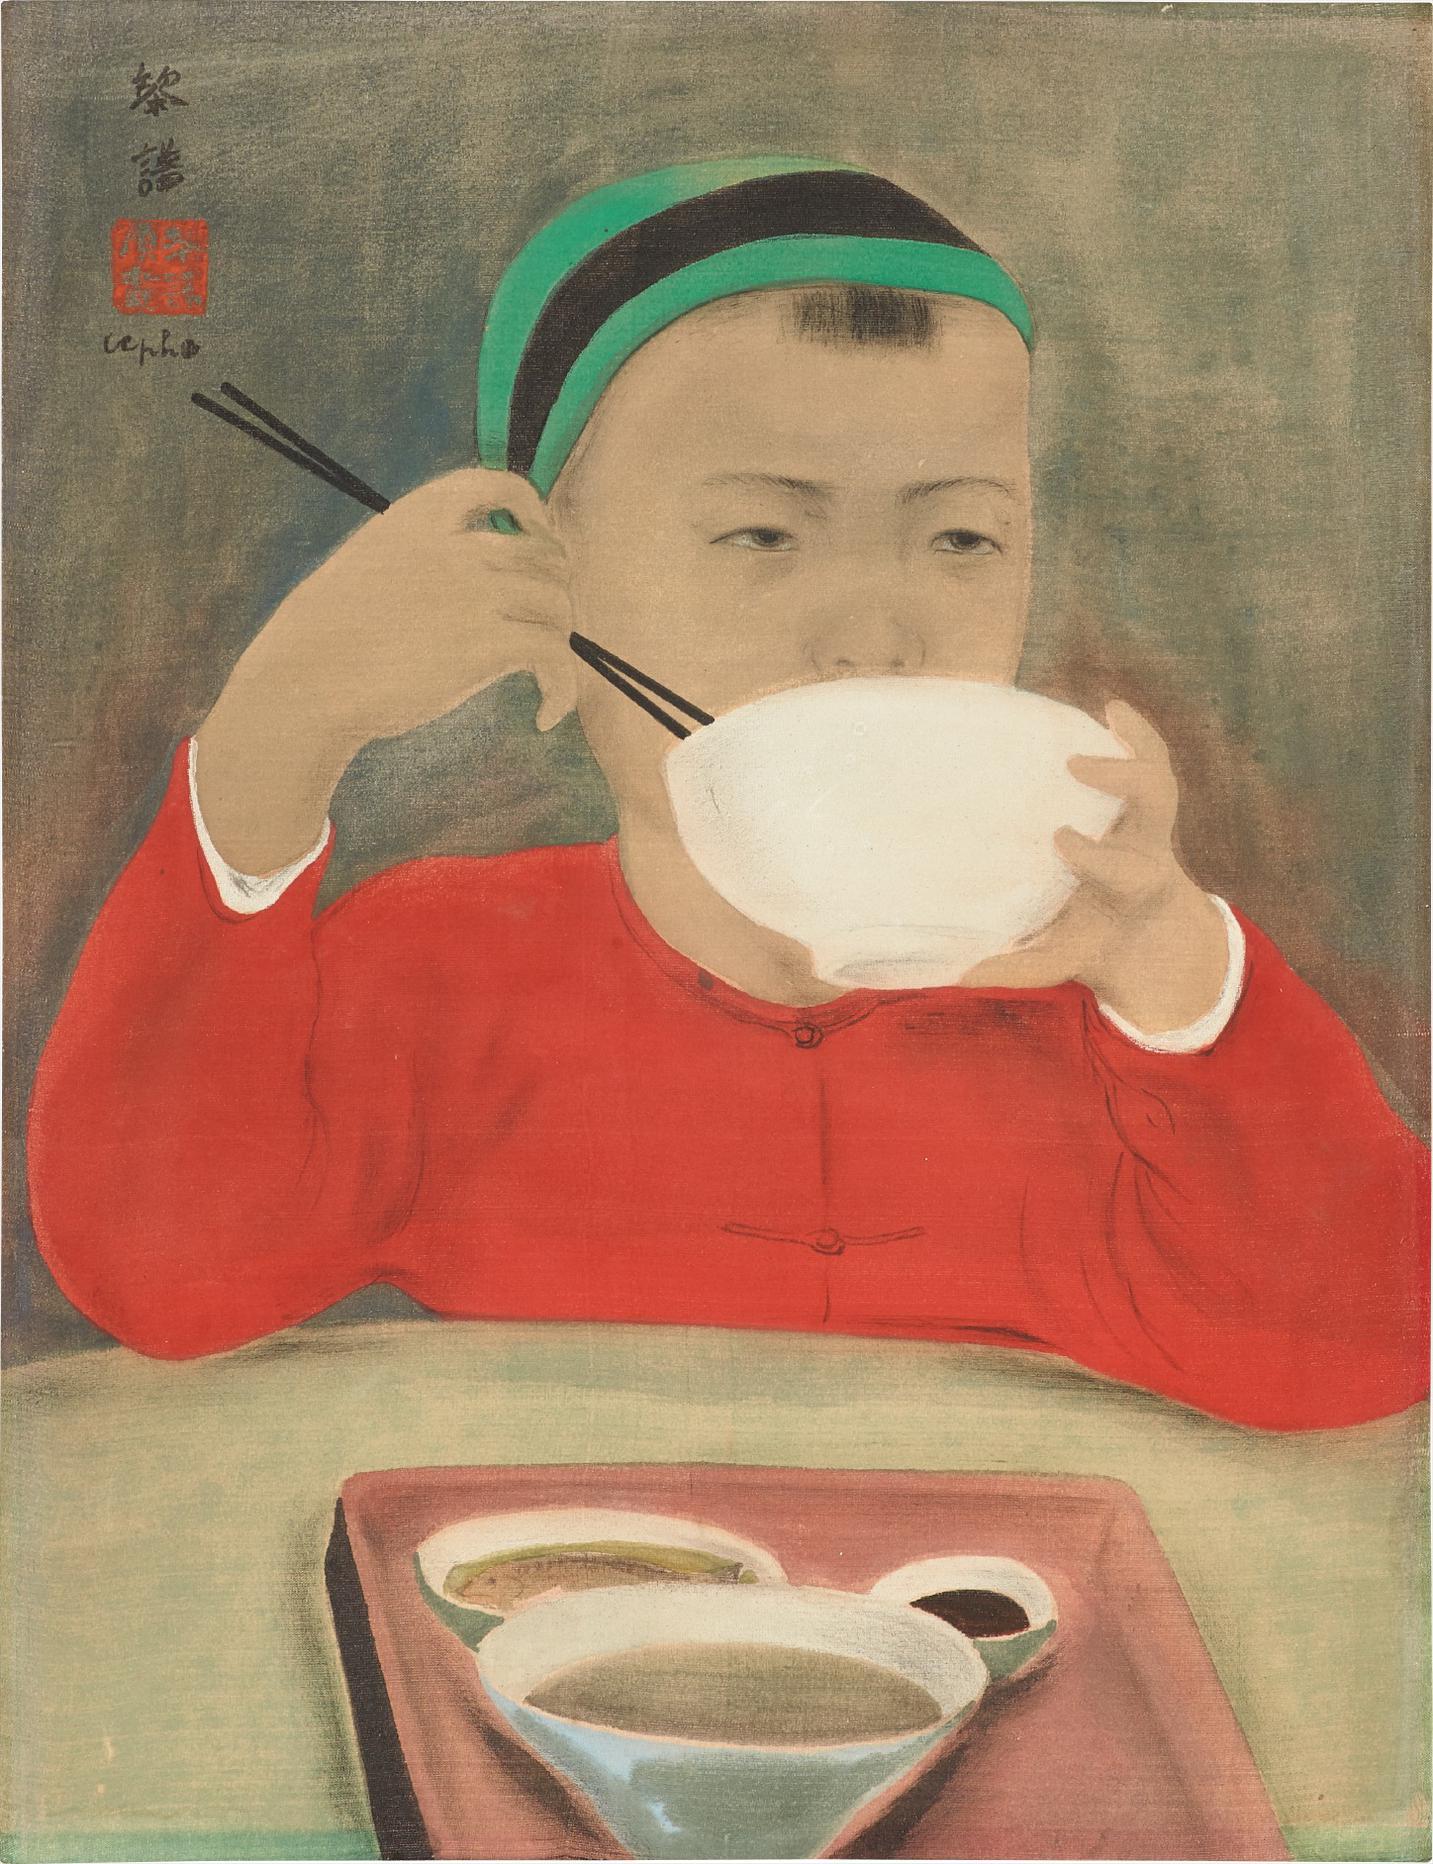 Le Pho-Le Diner-1938